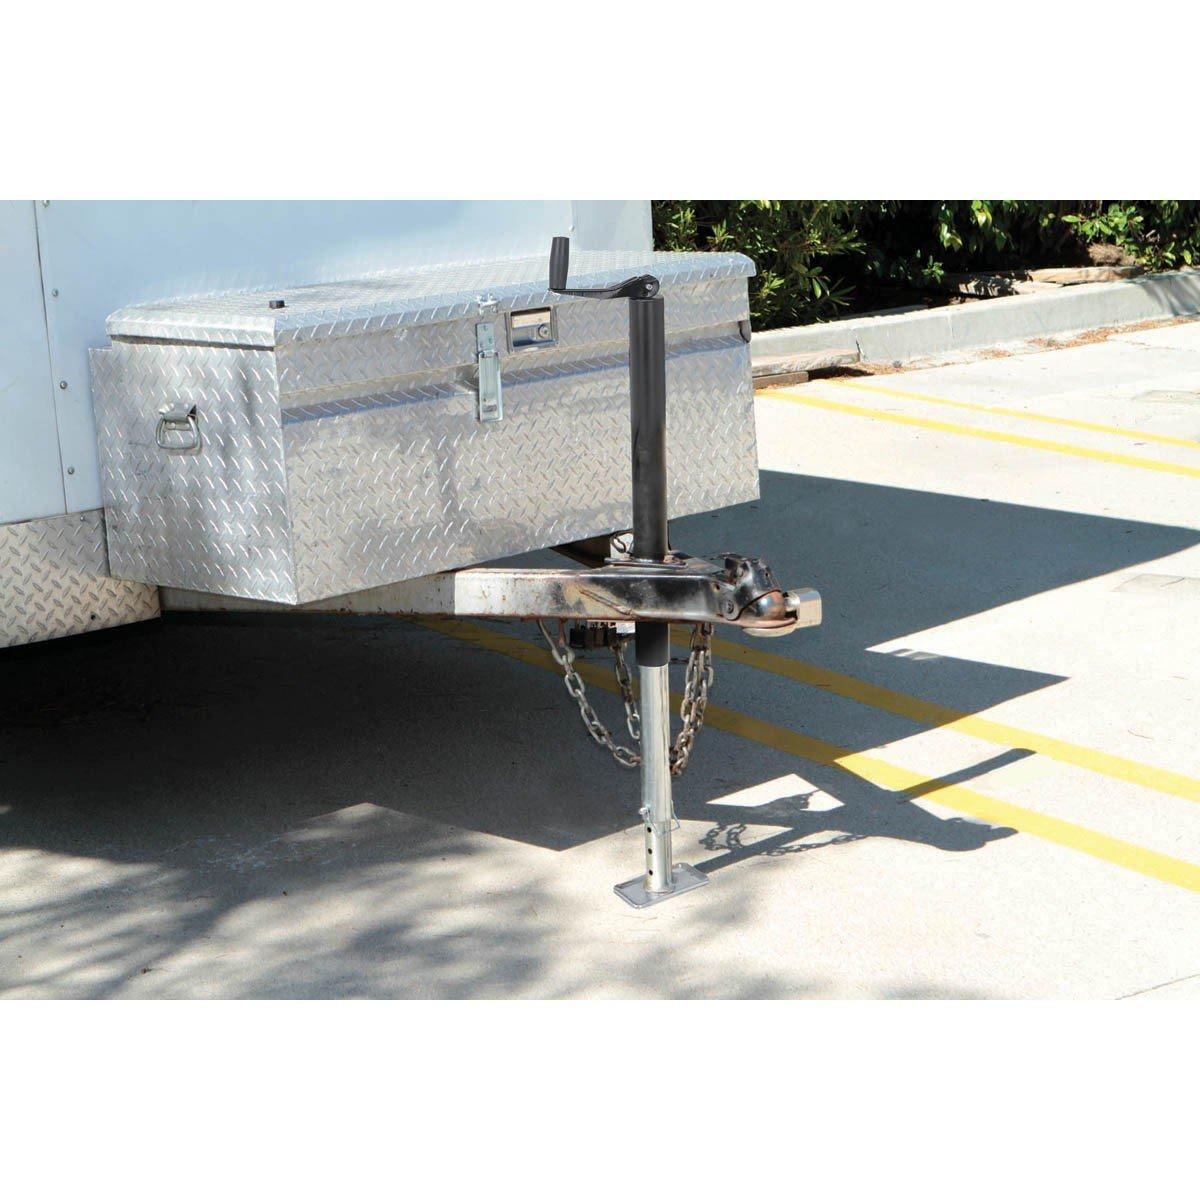 2000 Lb. Capacity Drop Leg A Frame Trailer Jack Heavy Hauls Heavy Duty Lift Holder